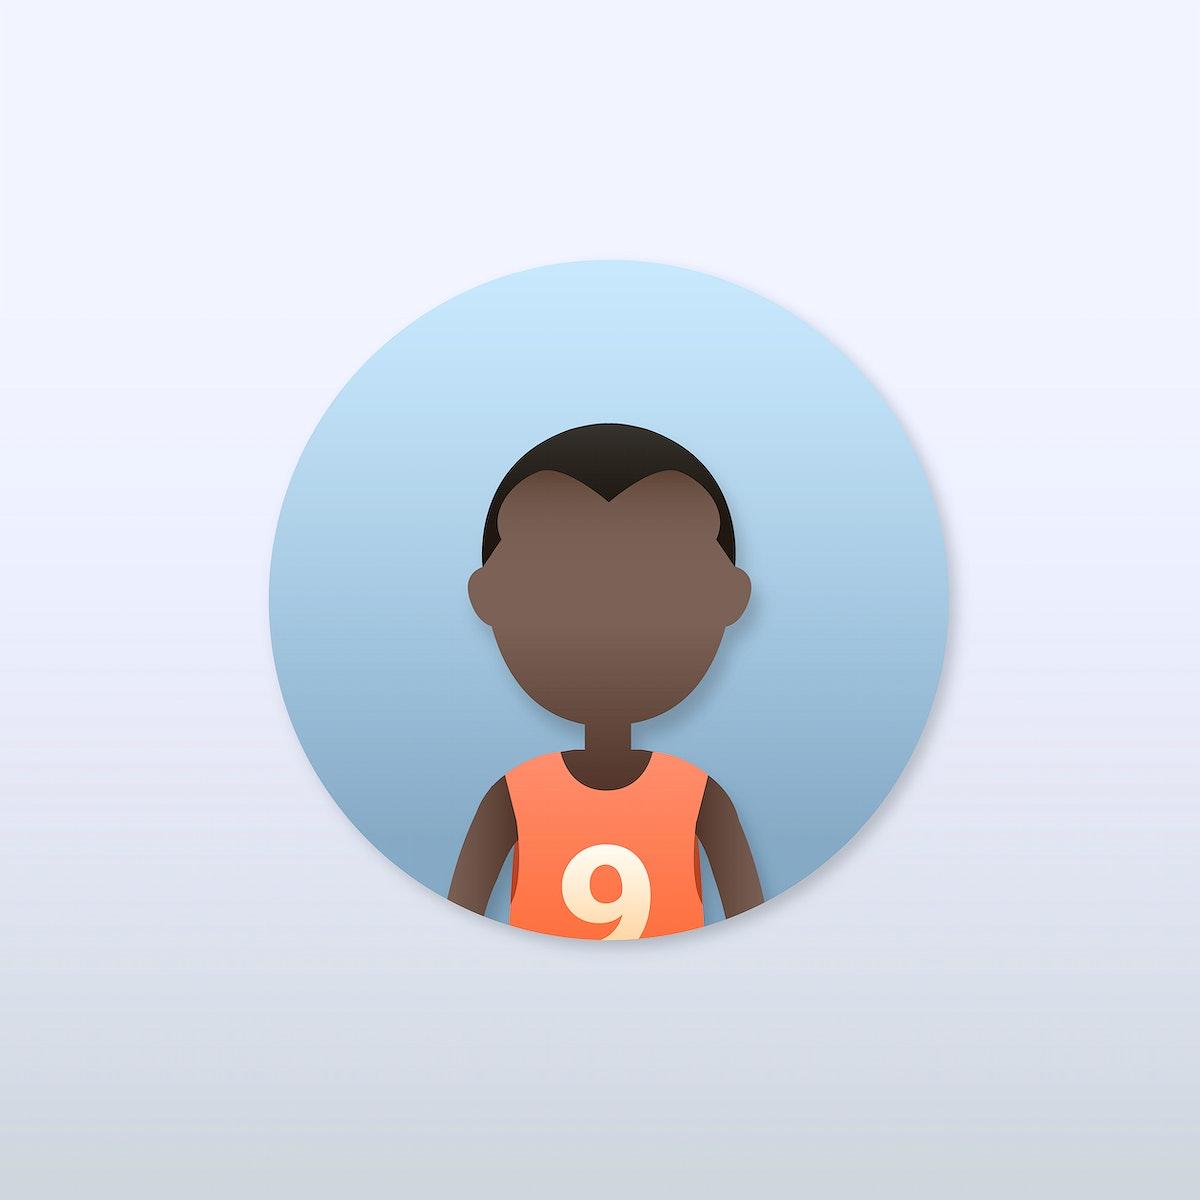 Young black man avatar illustration